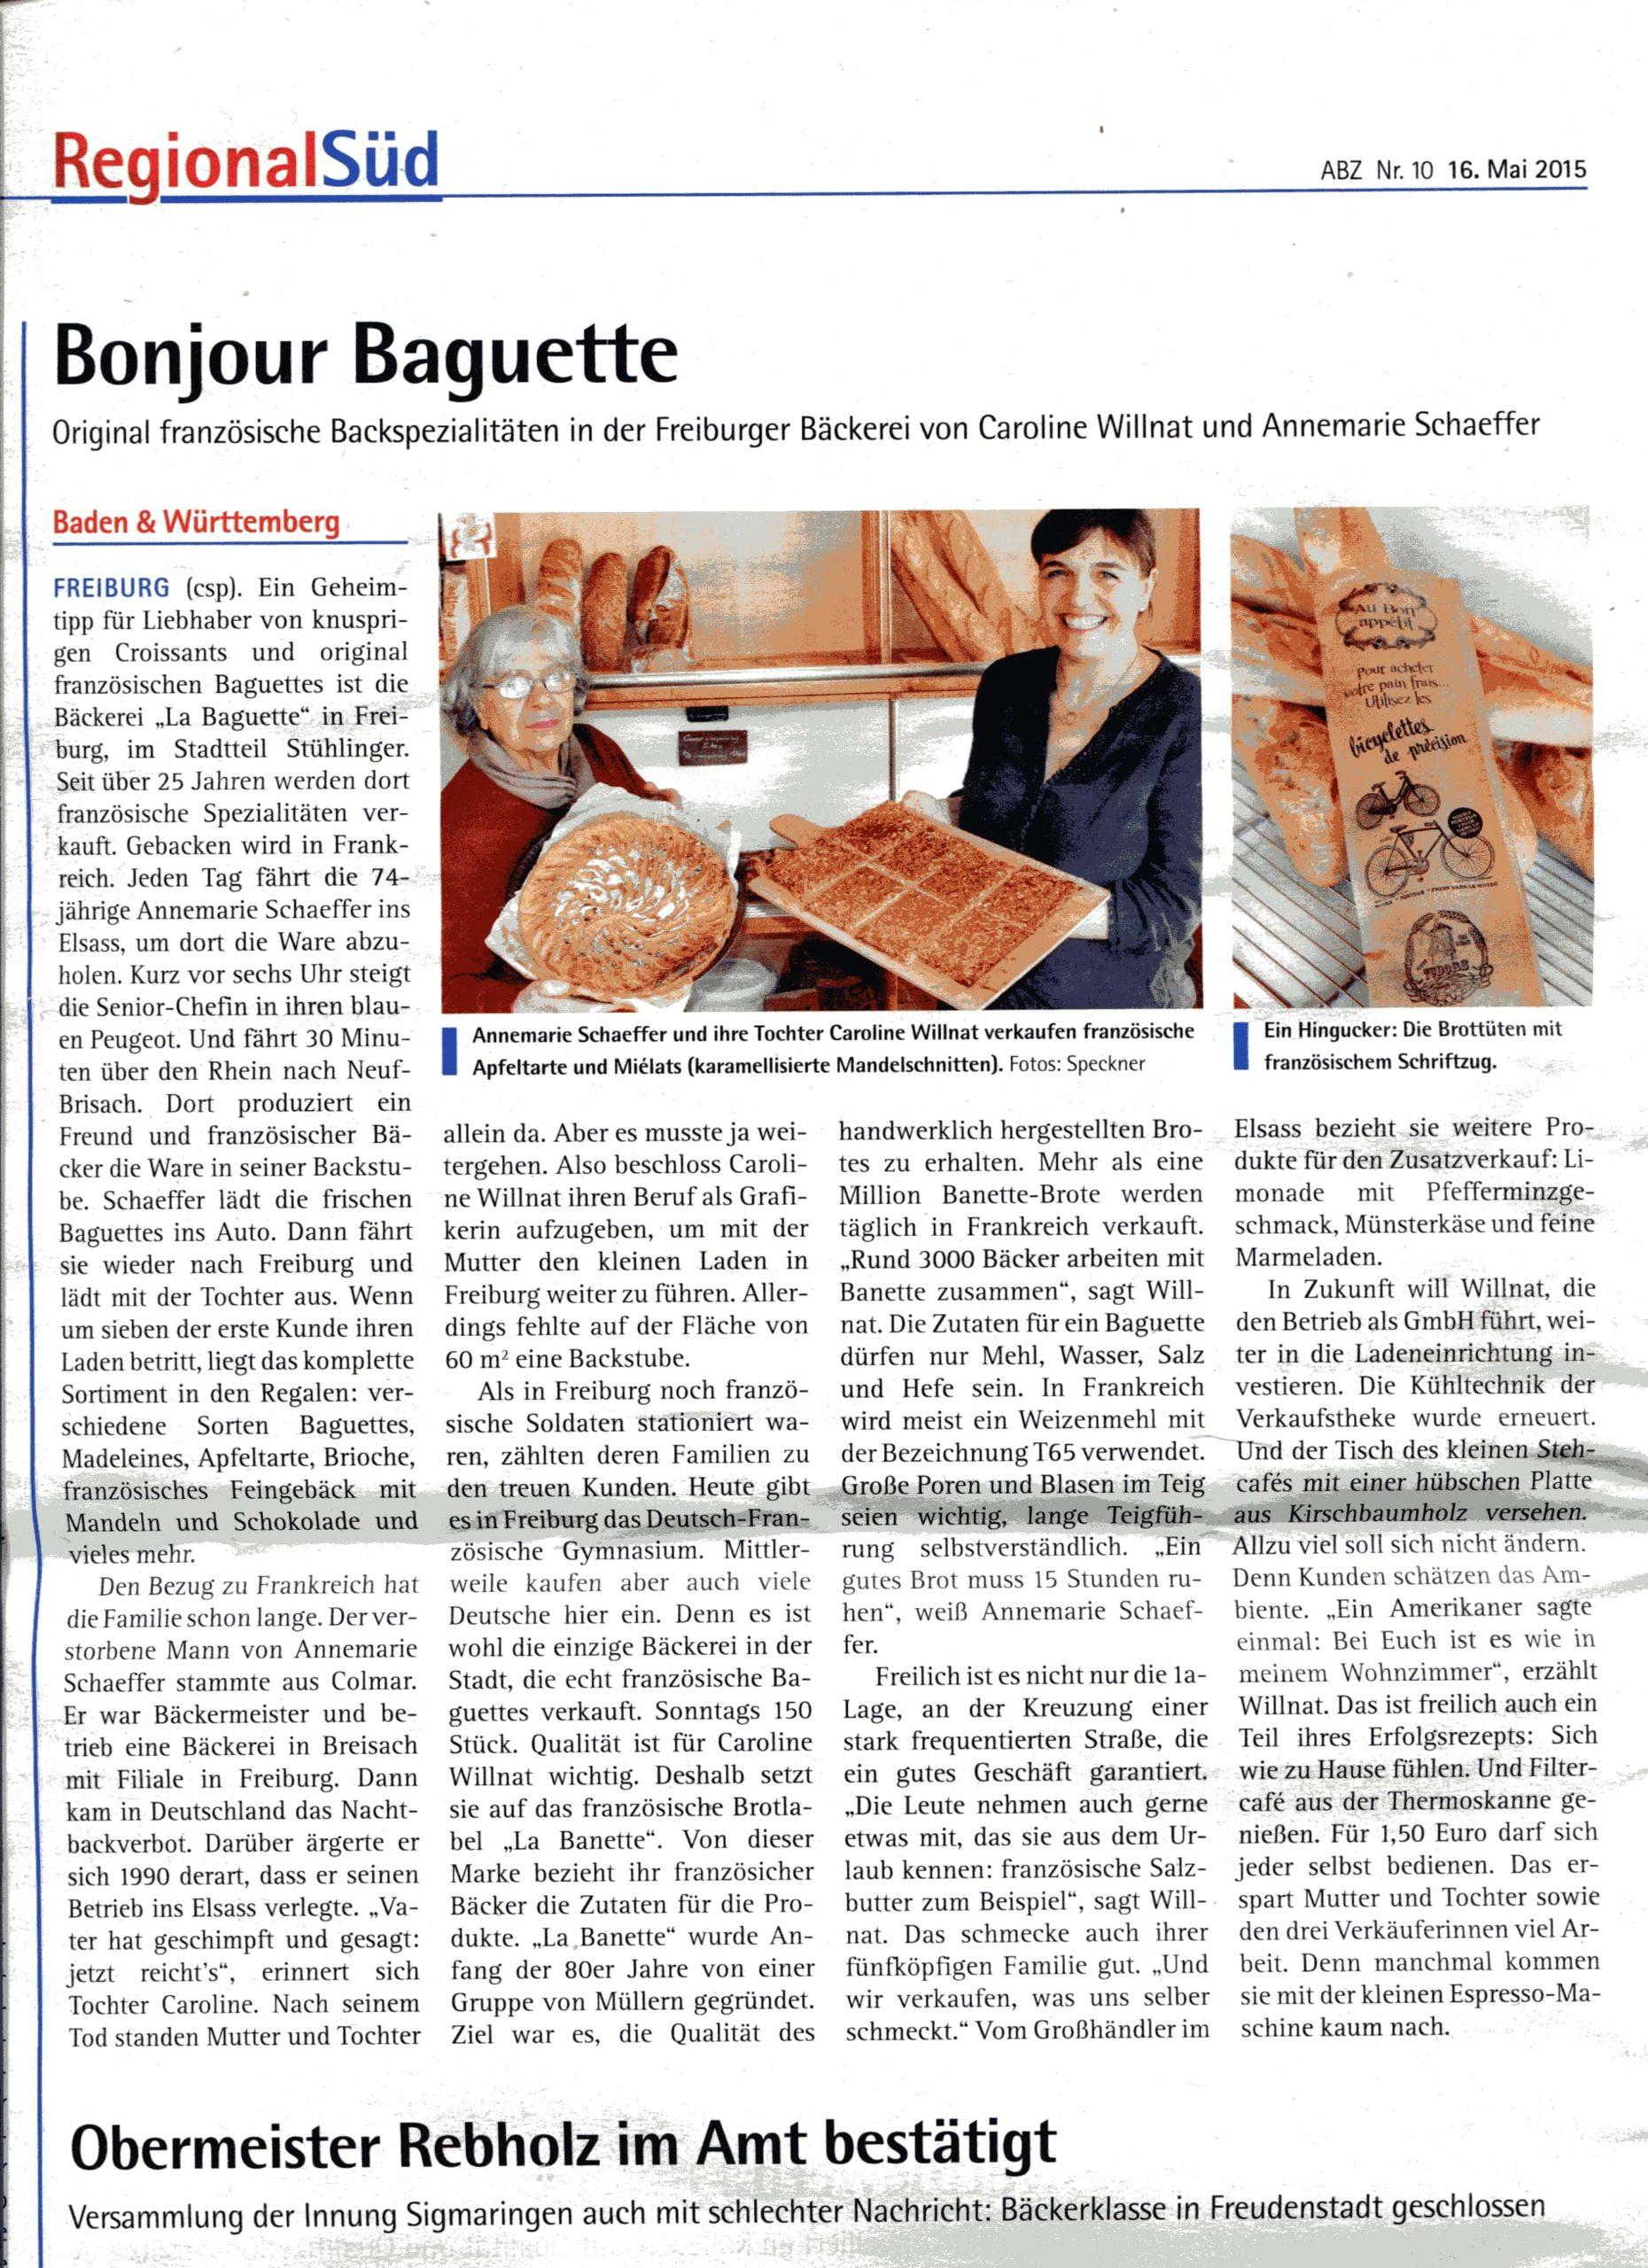 Bonjour Baguette ! (Regional Süd 16/05/2005)